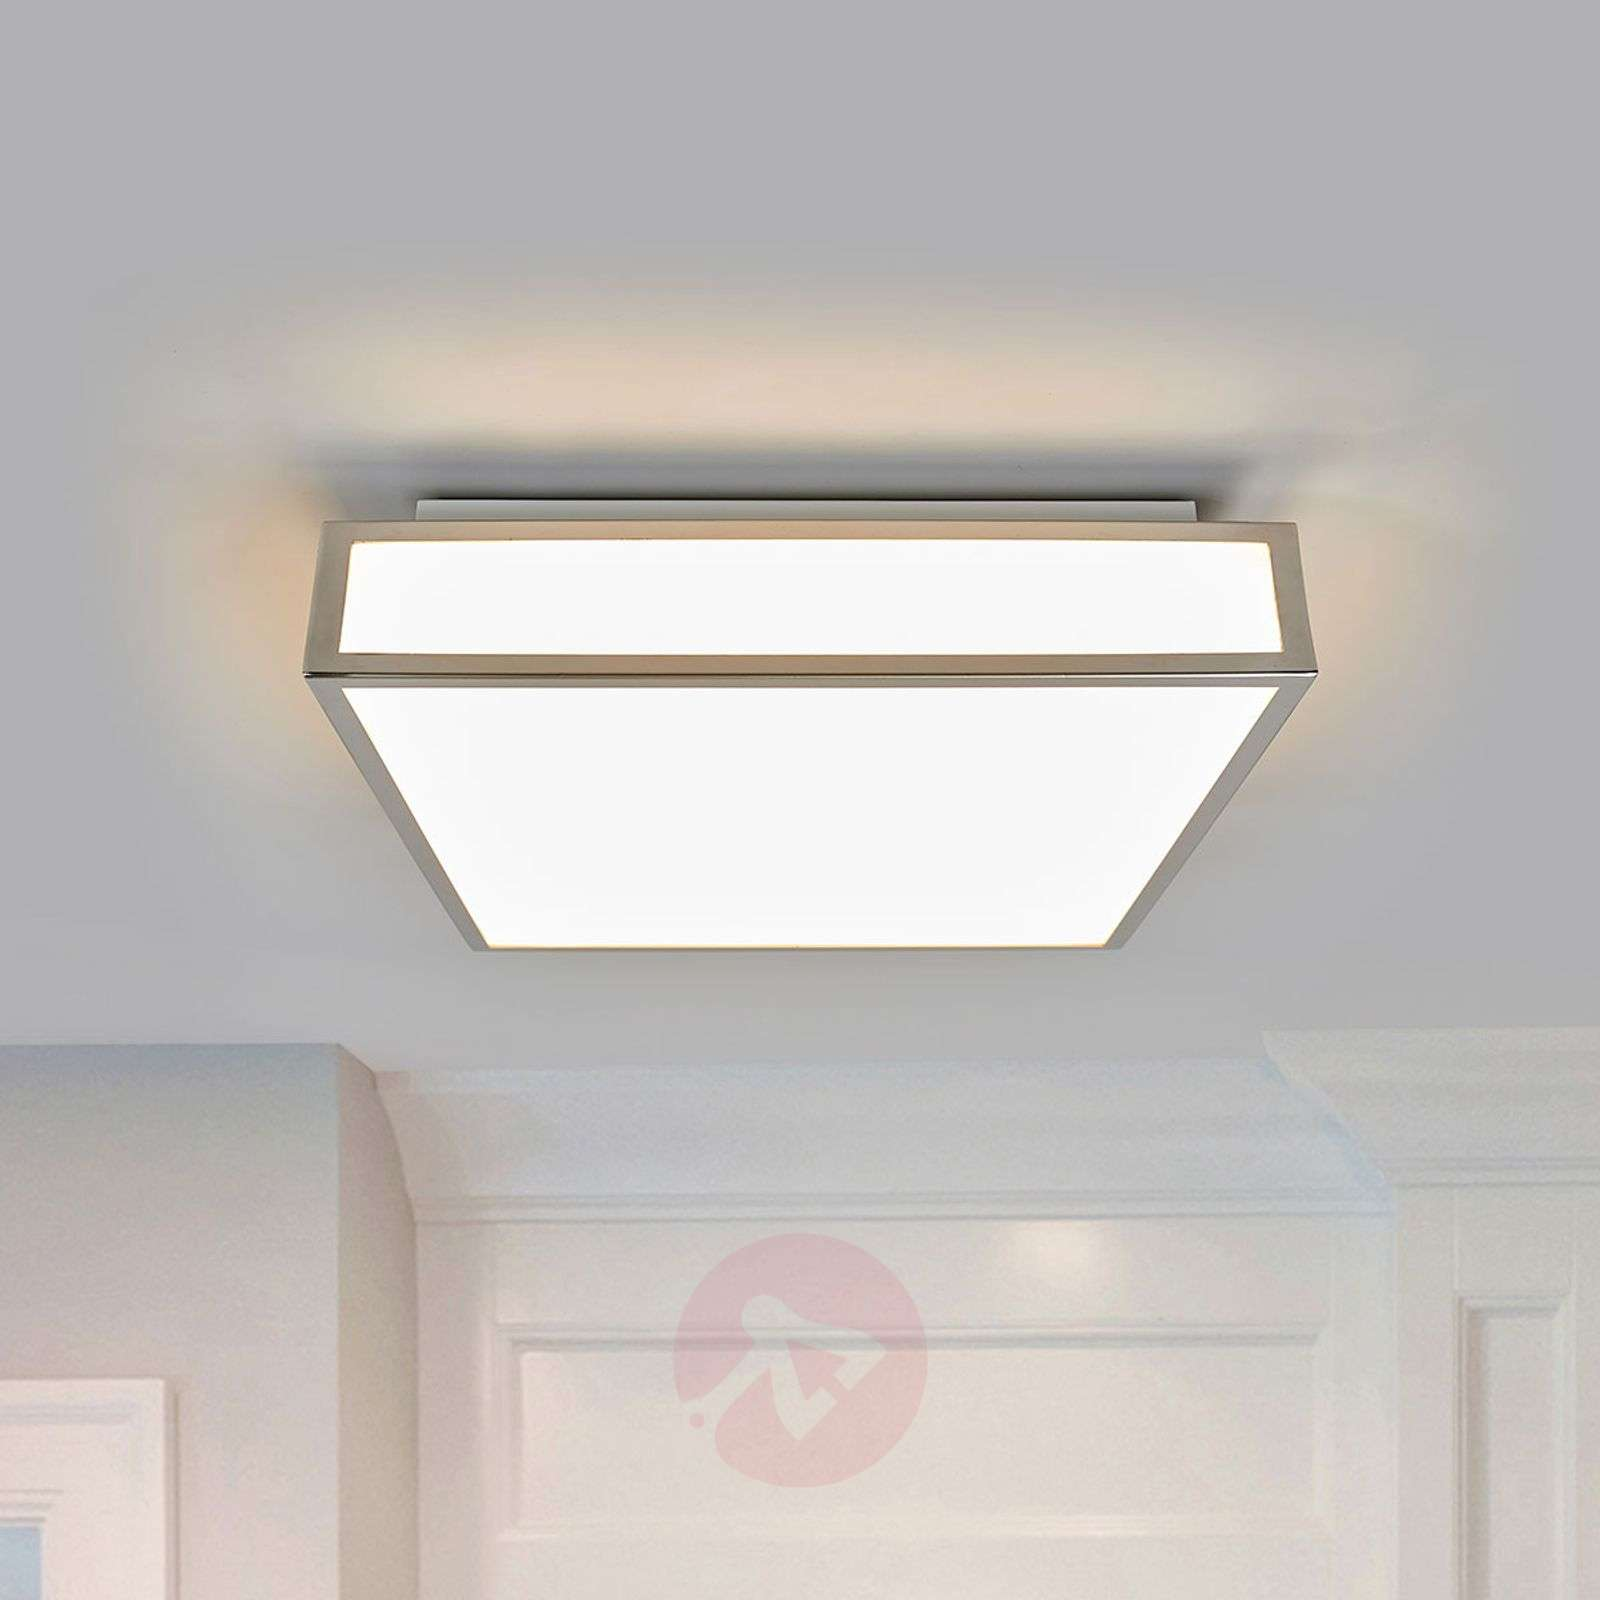 Damiano LED ceiling lamp, angular-9625168-02